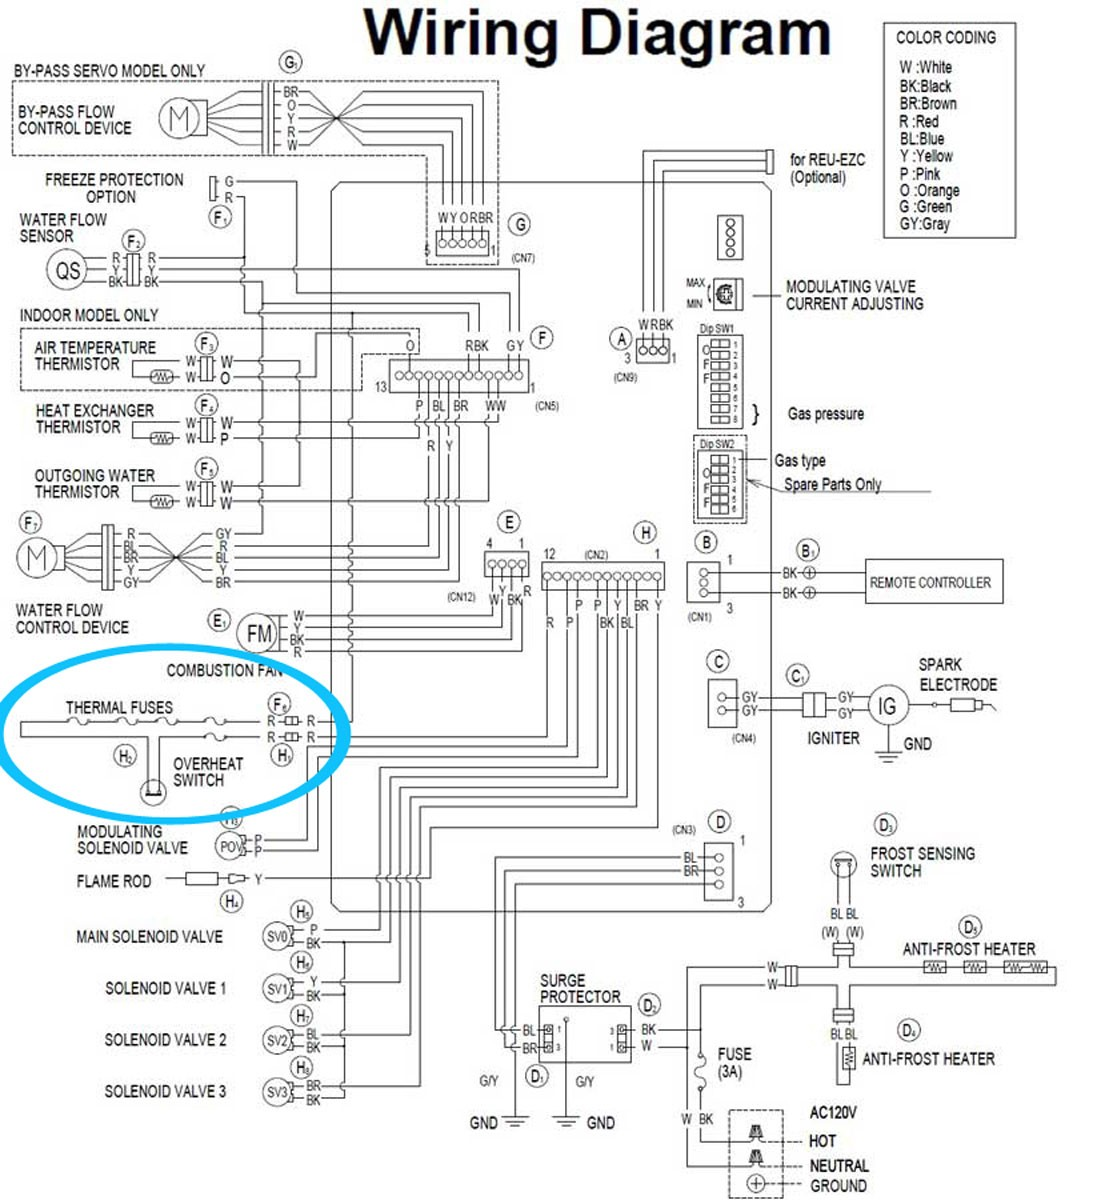 rheem electric water heater wiring diagram awesome wiring diagram